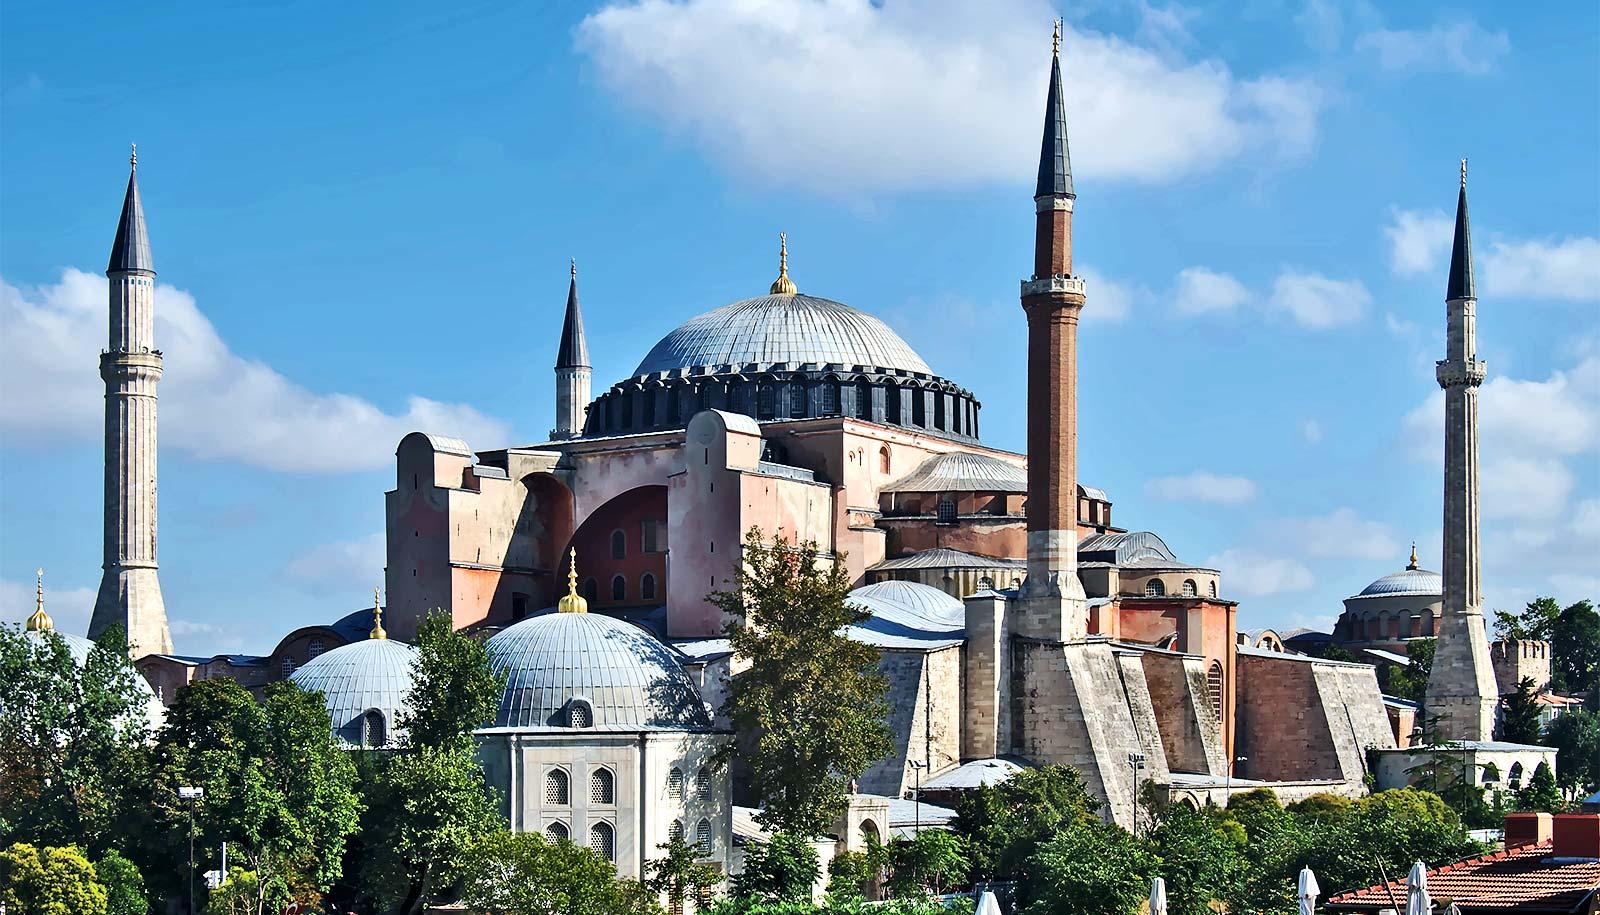 Hagia Sophia 'time tunnel' linked Ottoman and Roman Empires - Futurity